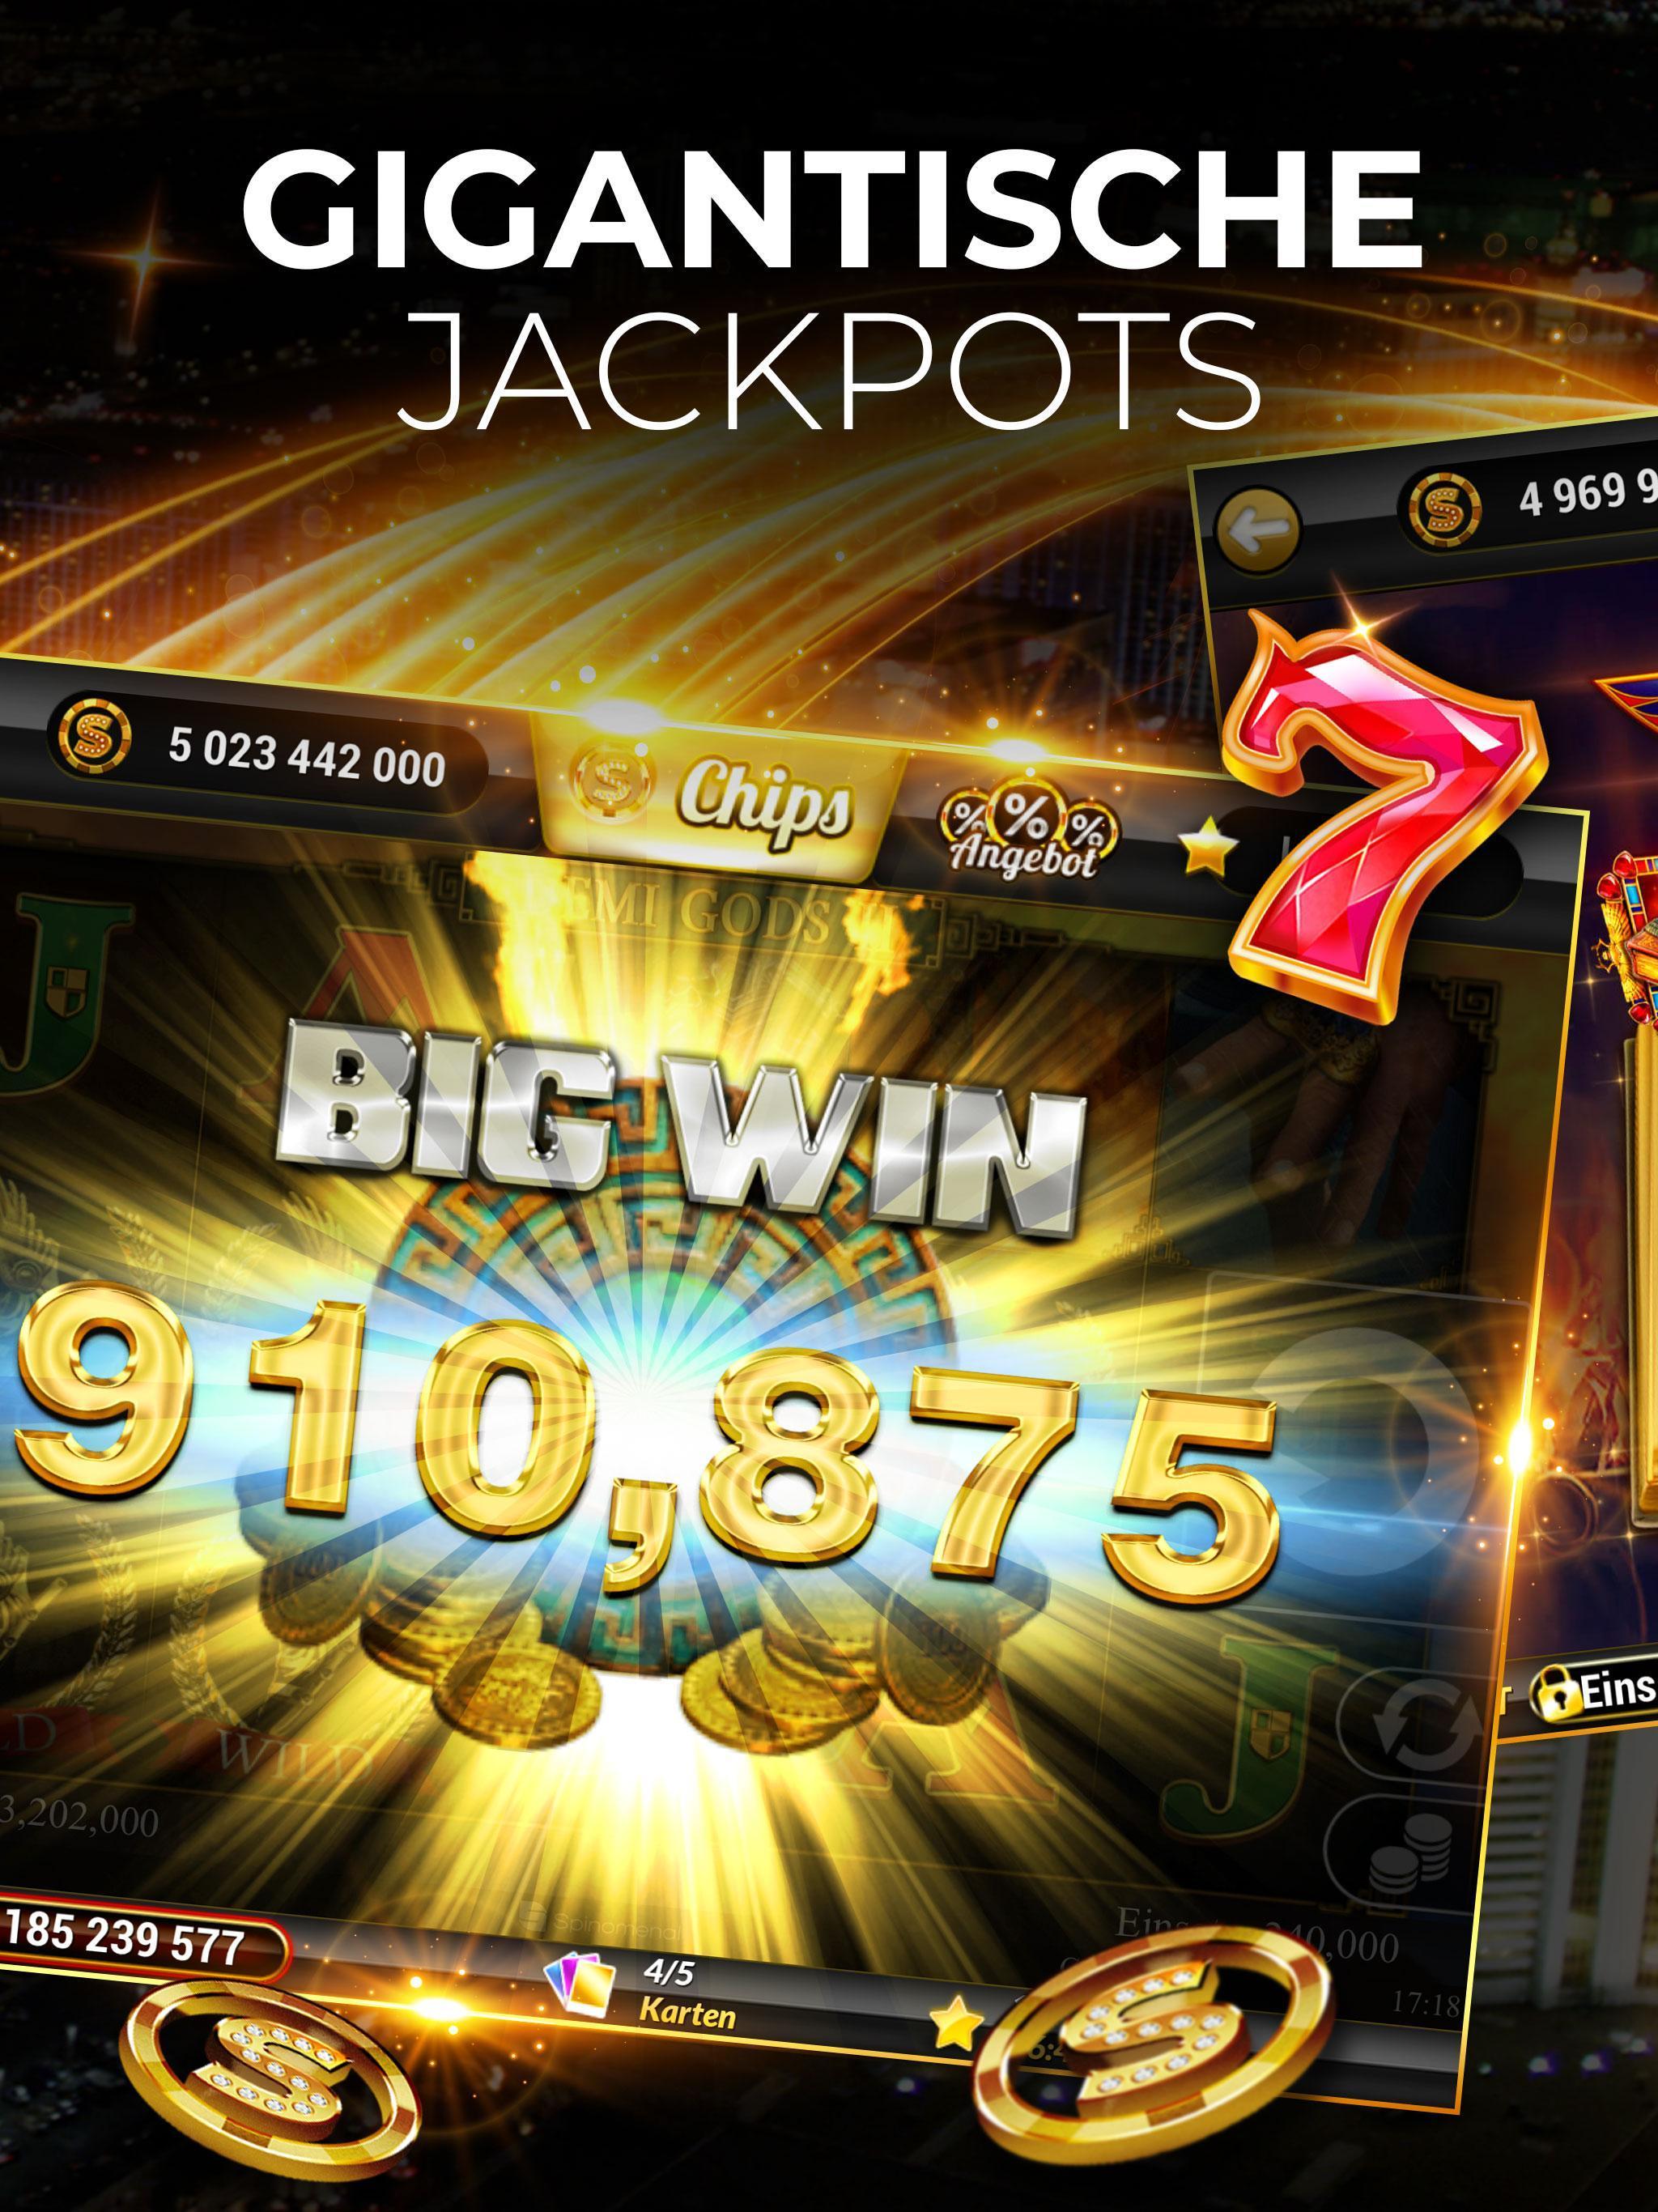 Slotigo Online-Casino, Spielautomaten & Jackpots 4.11.11 Screenshot 14